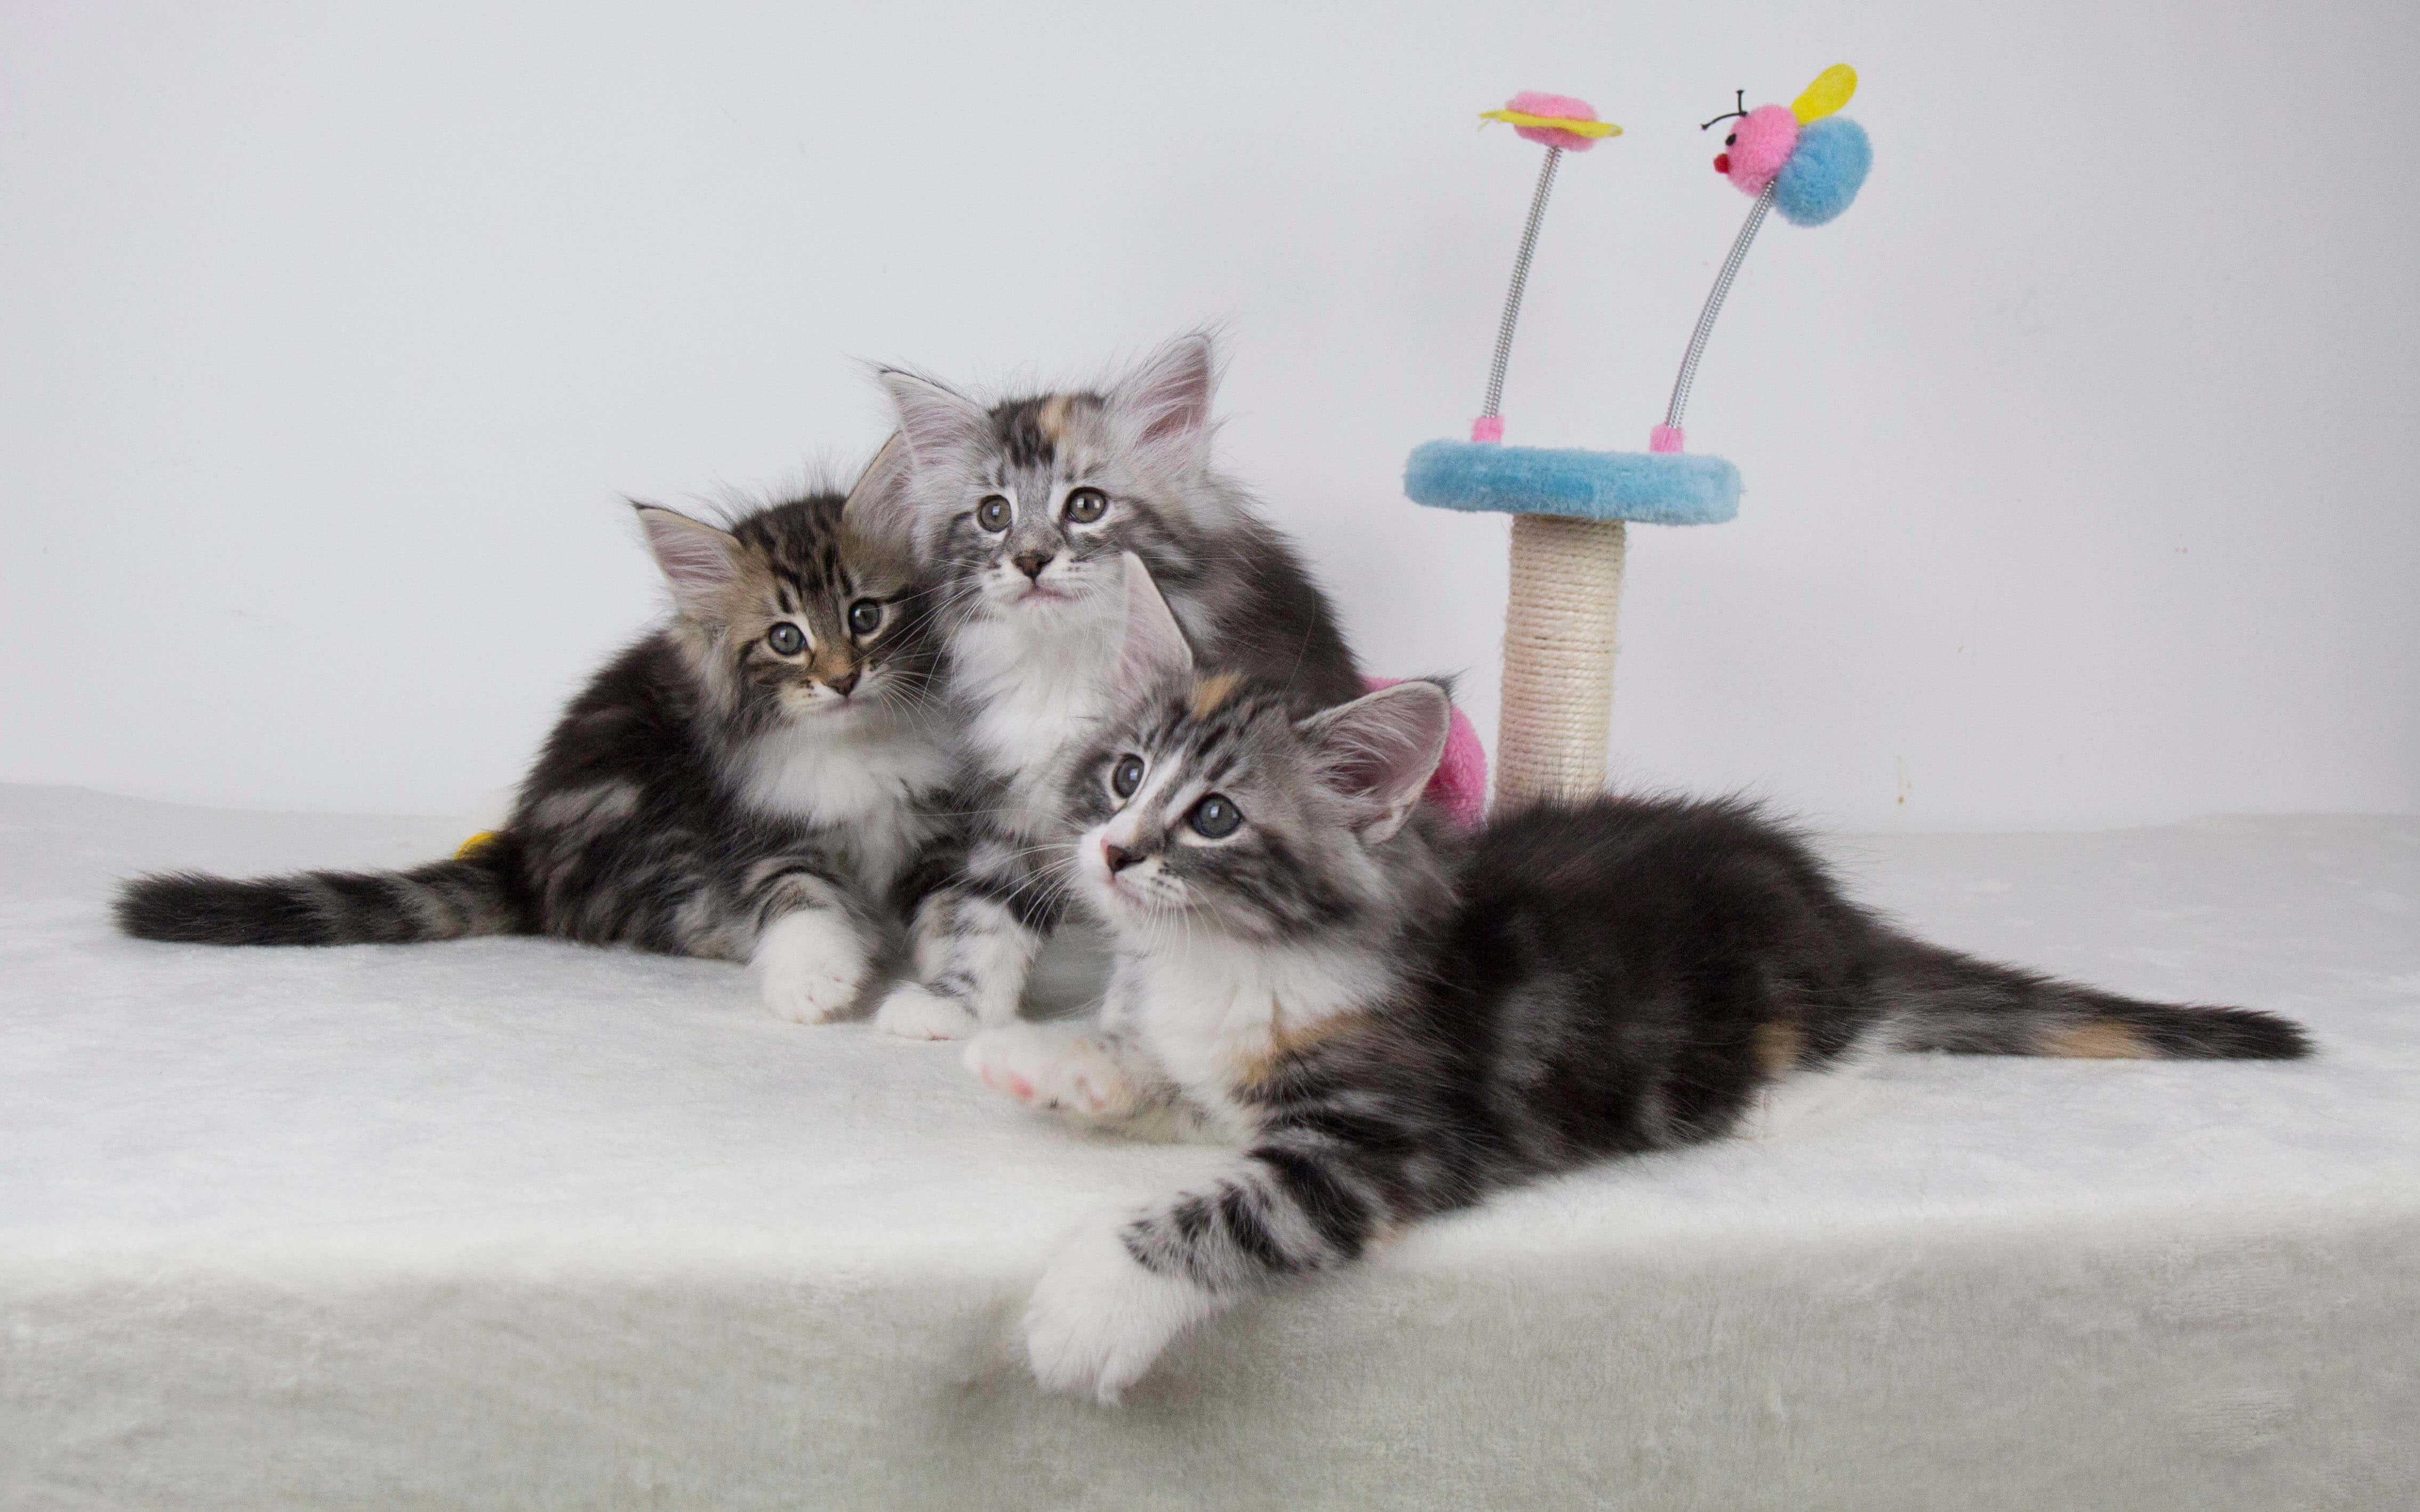 Welcome • DK Silverleaf • Norsk Skovkatte • Norwegian Forest cats